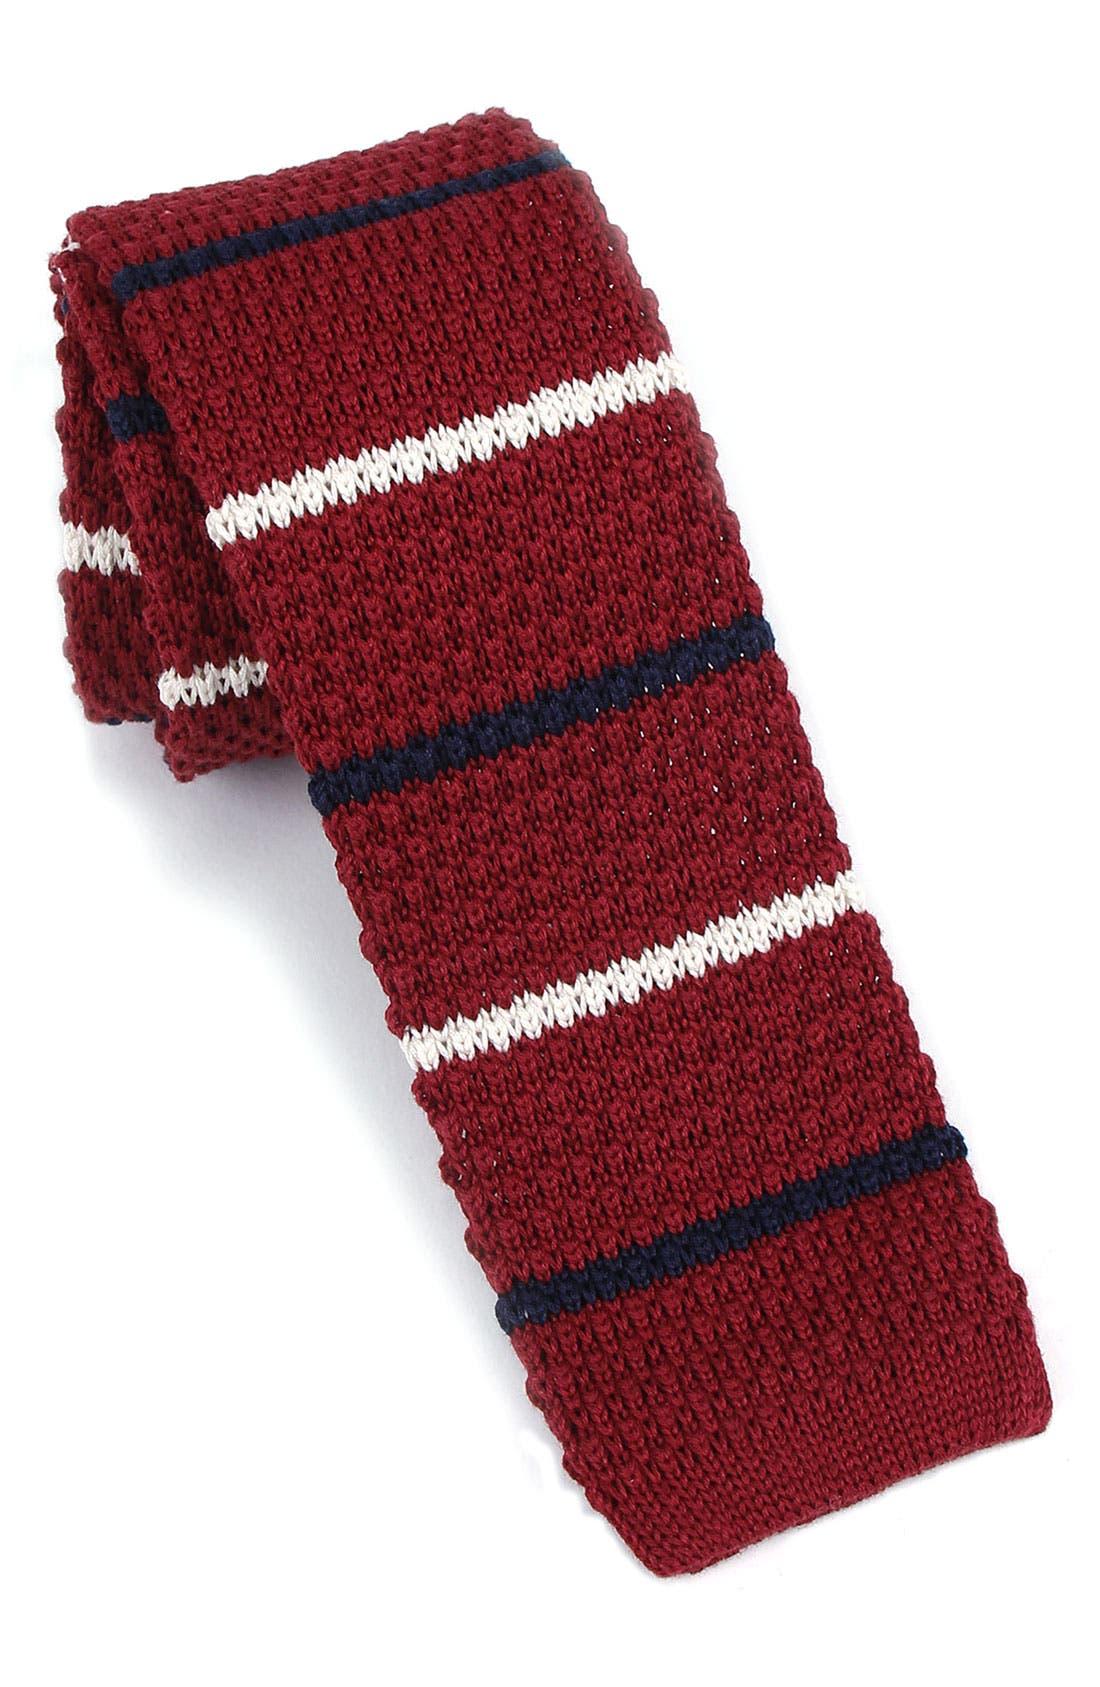 Alternate Image 1 Selected - 1901 Skinny Knit Tie